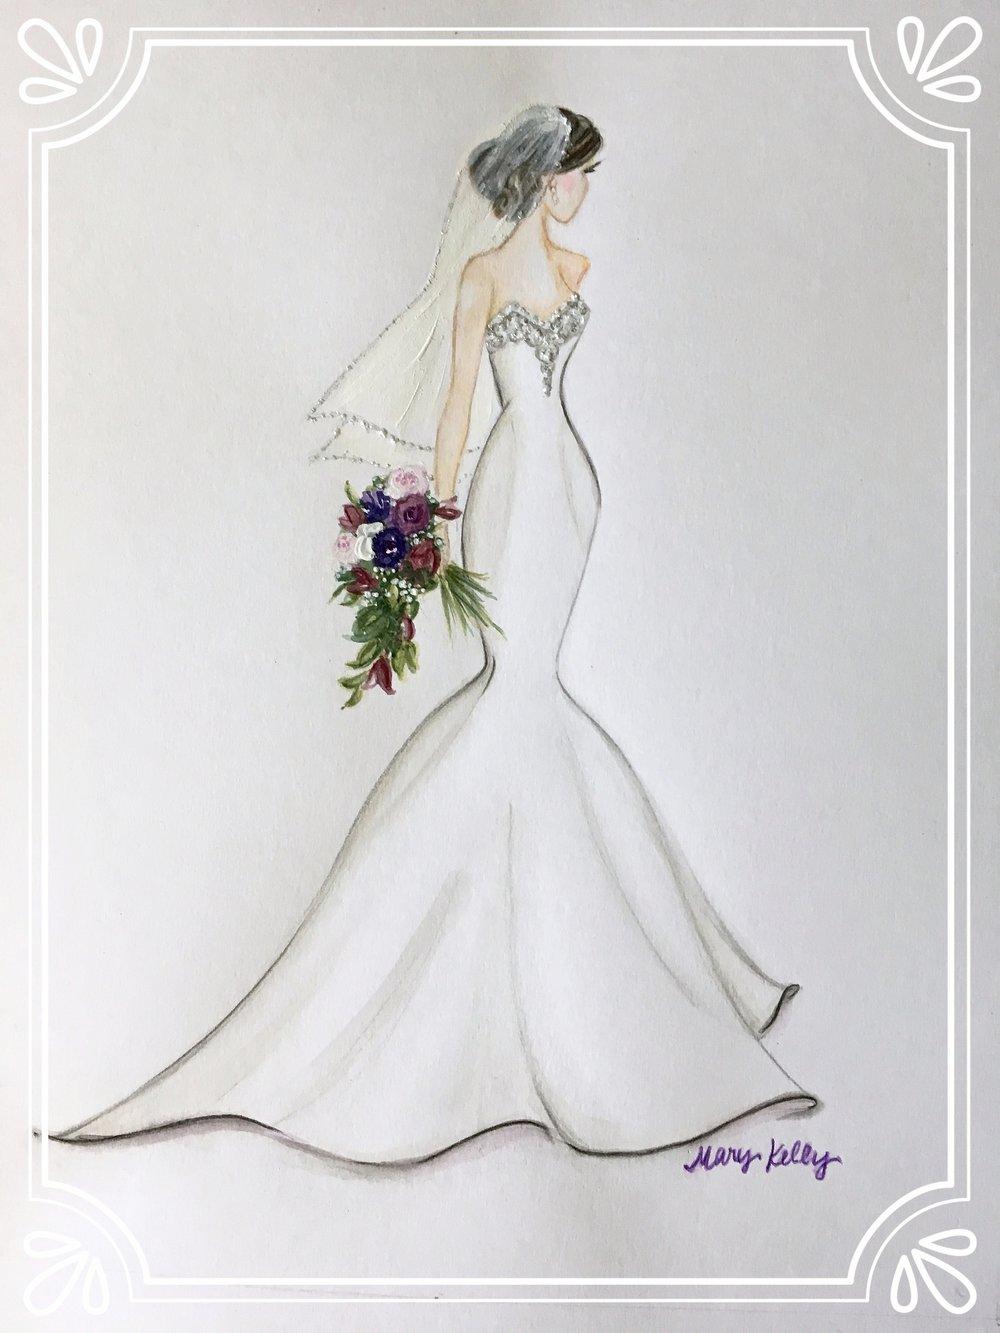 alexa's wedding gown, mary kelly designs © 2018